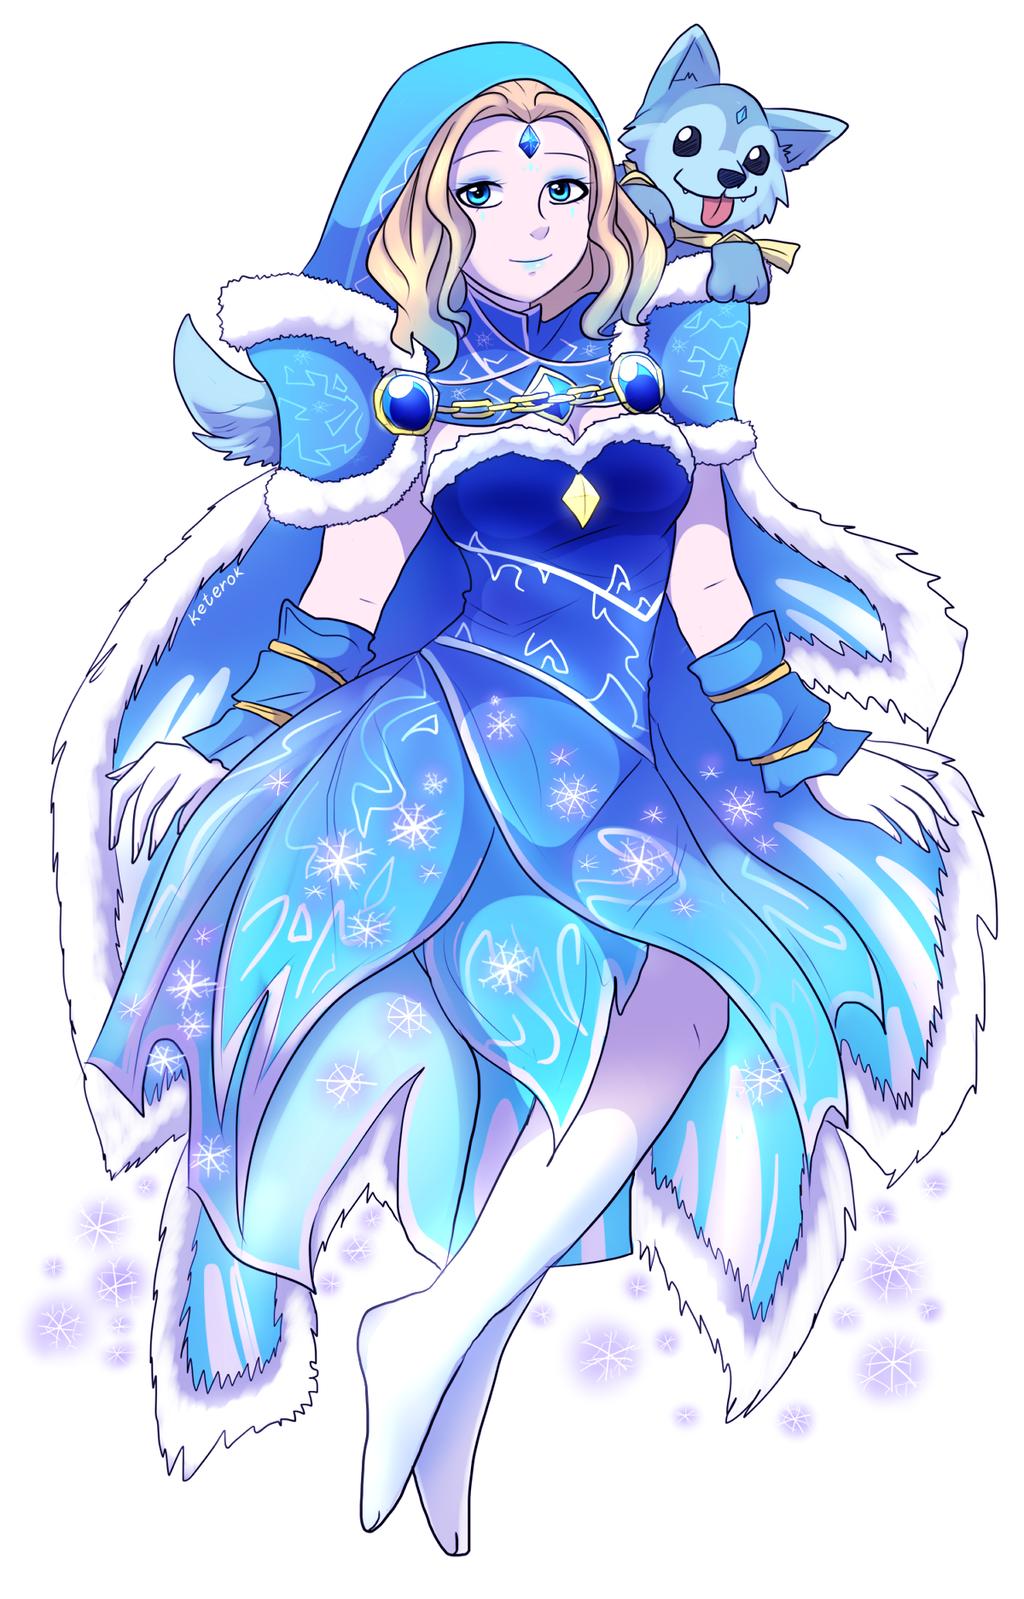 Crystal Maiden Arcana by keterok on DeviantArt